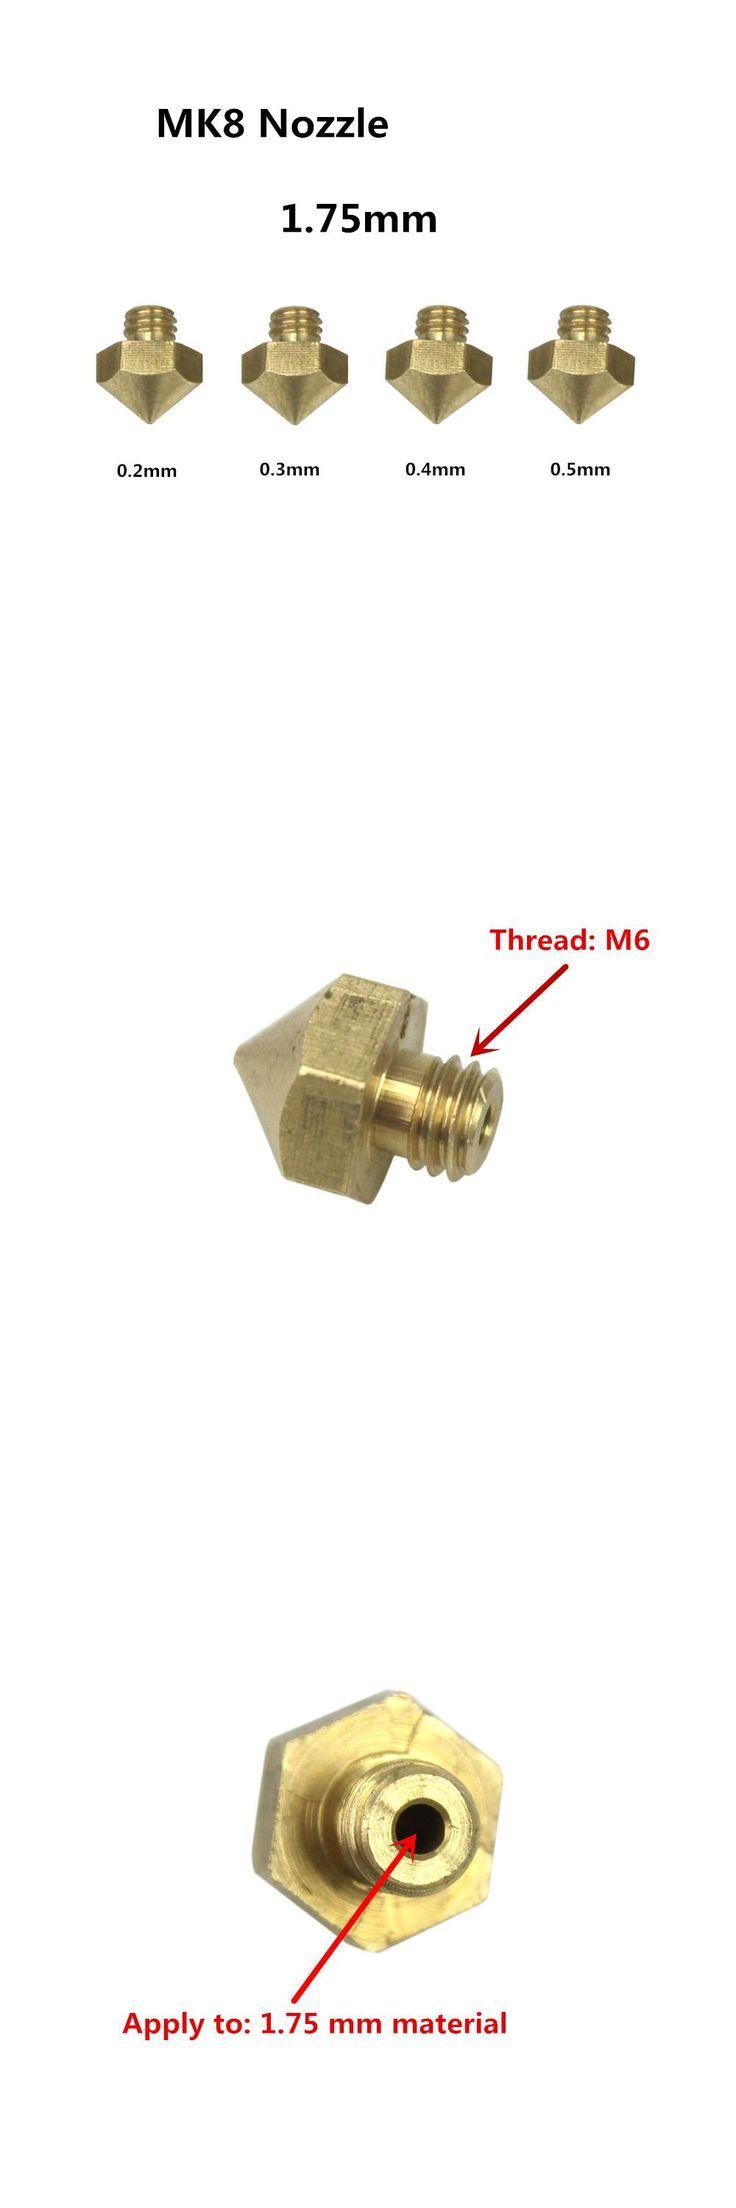 [Visit to Buy] 5Pcs Makerbot MK8 nozzle impressora 3D printer Extruder nozzle for Prusa i3 extruder #Advertisement